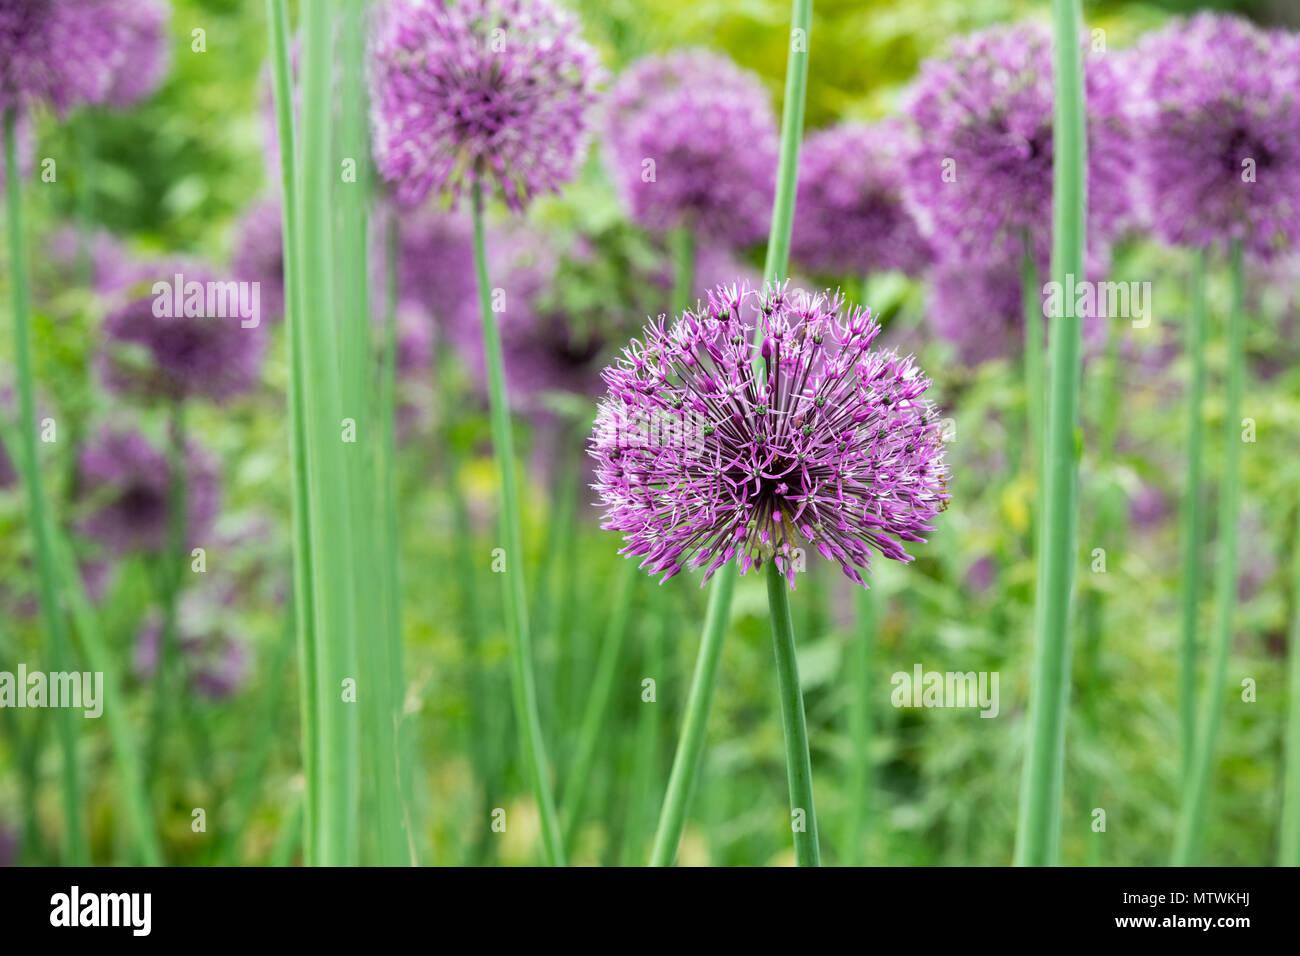 Allium Jesdianum Early Emperor Ornamental Onion Flowers In Spring